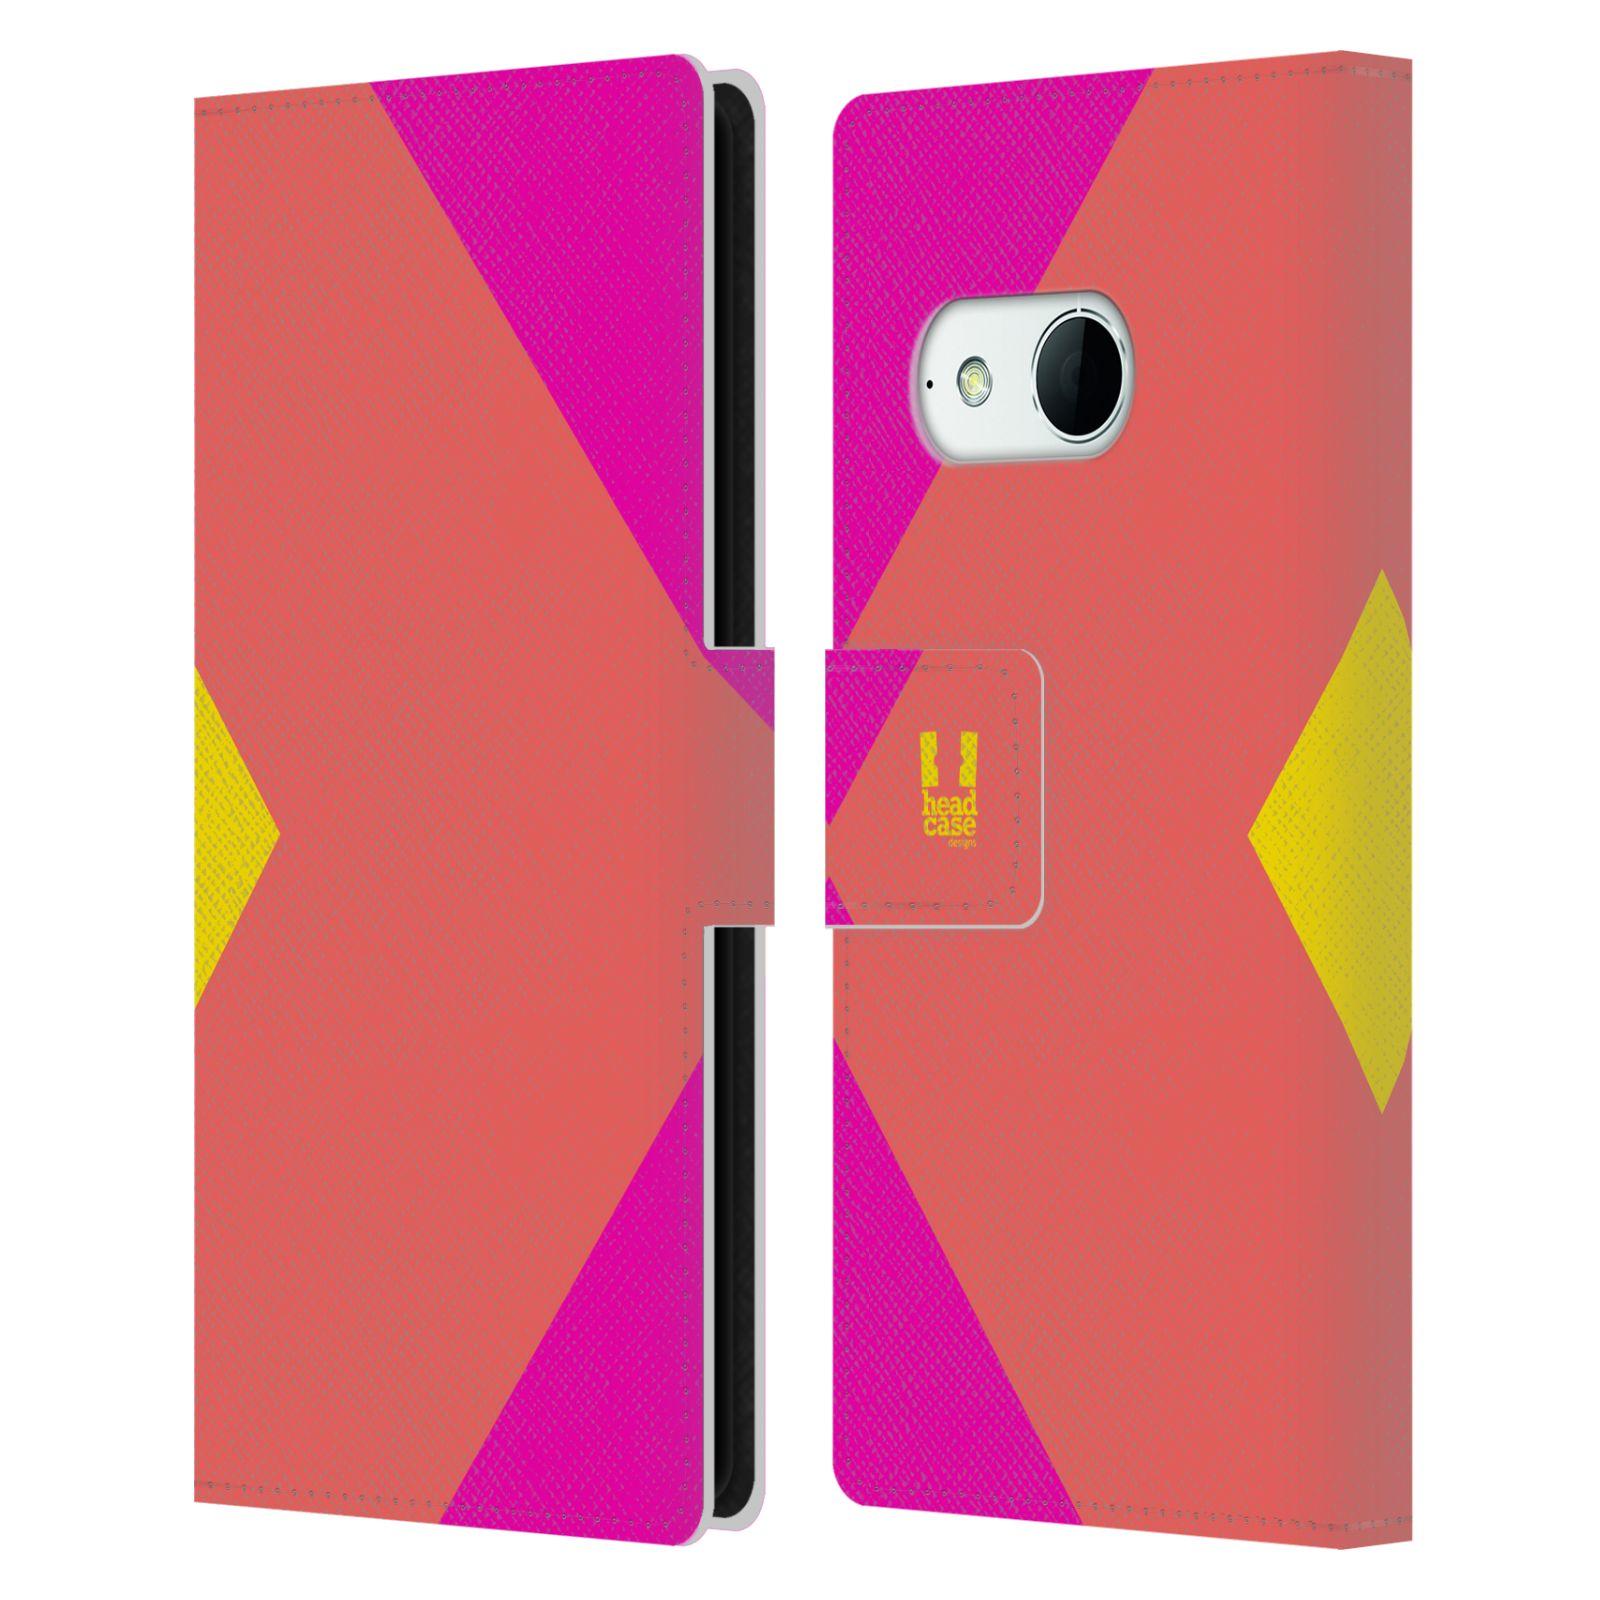 HEAD CASE Flipové pouzdro pro mobil HTC ONE MINI 2 barevné tvary růžová korál